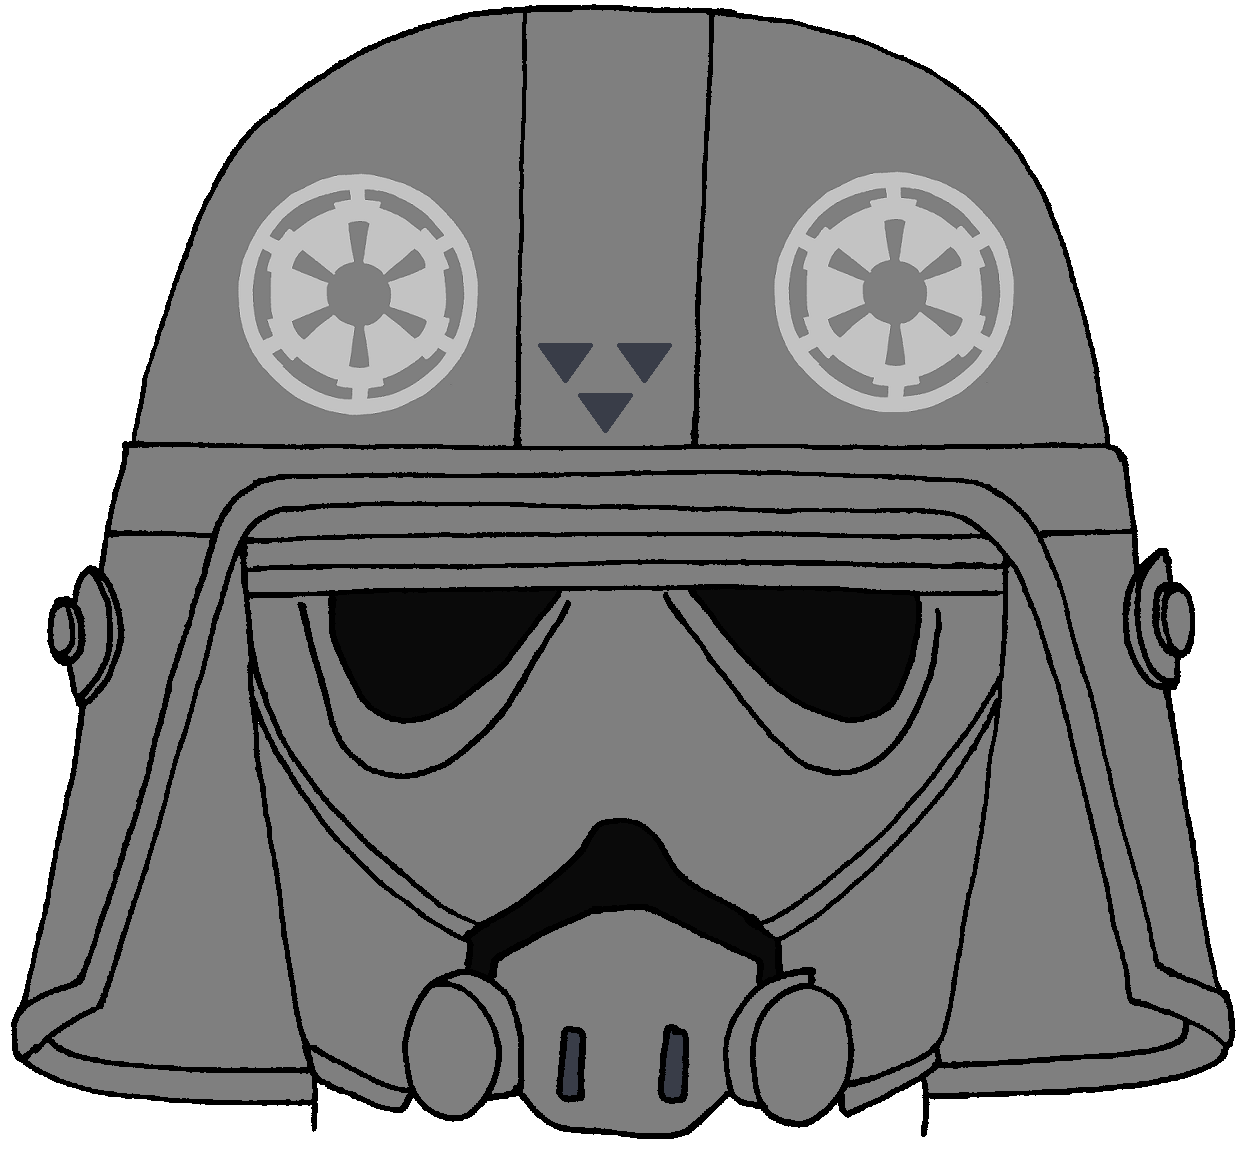 Imperial Troop Transport Pilot's Helmet Star wars art